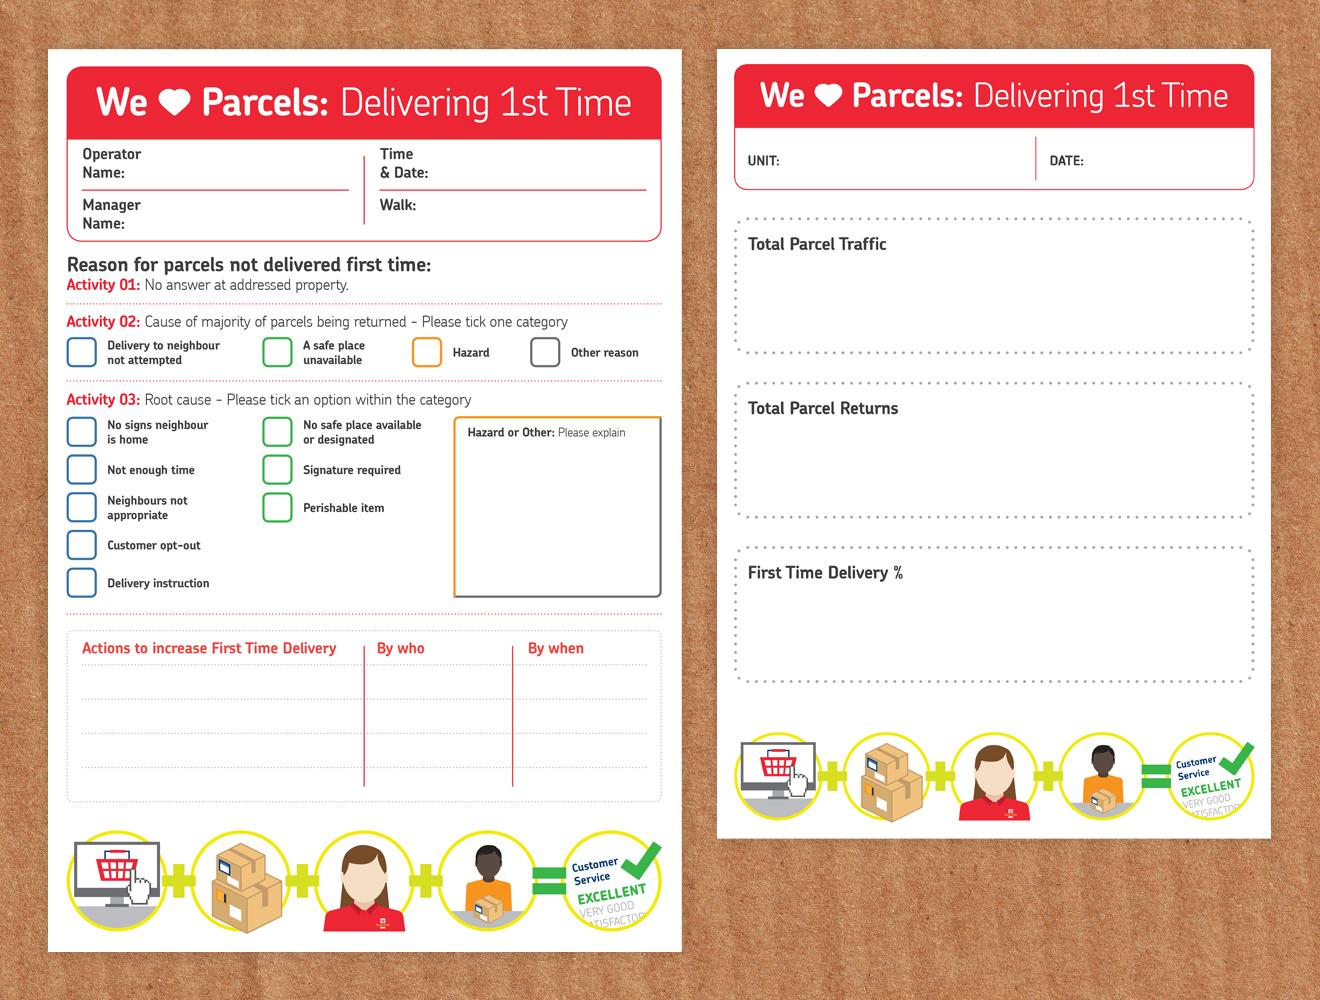 We love parcels Royal Mail